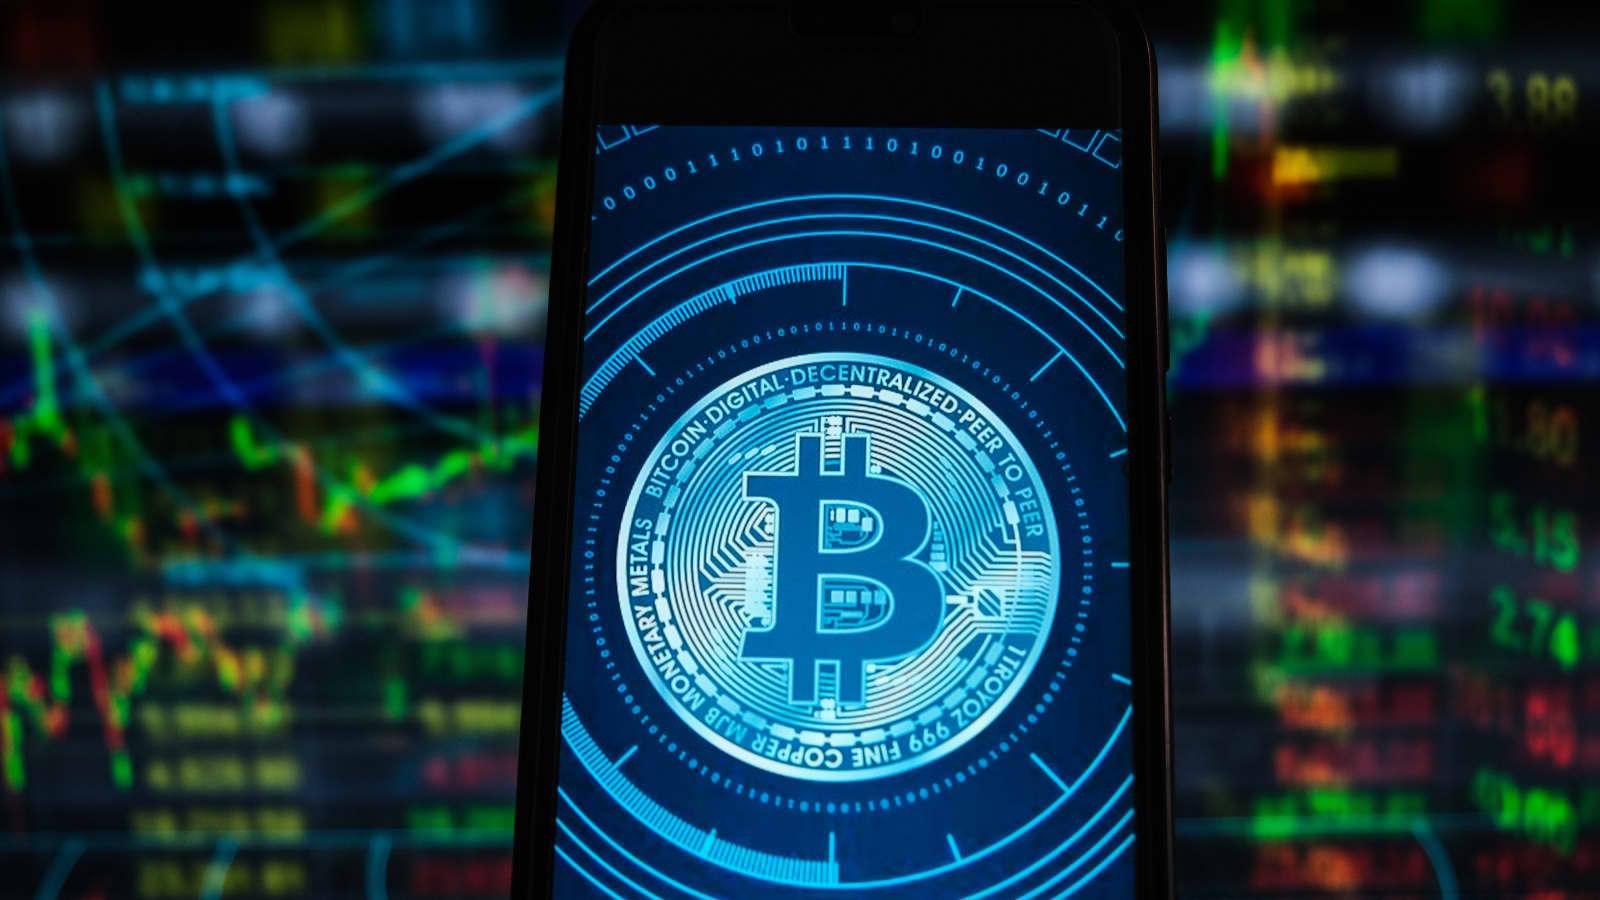 Why is bitcoin so volatile?